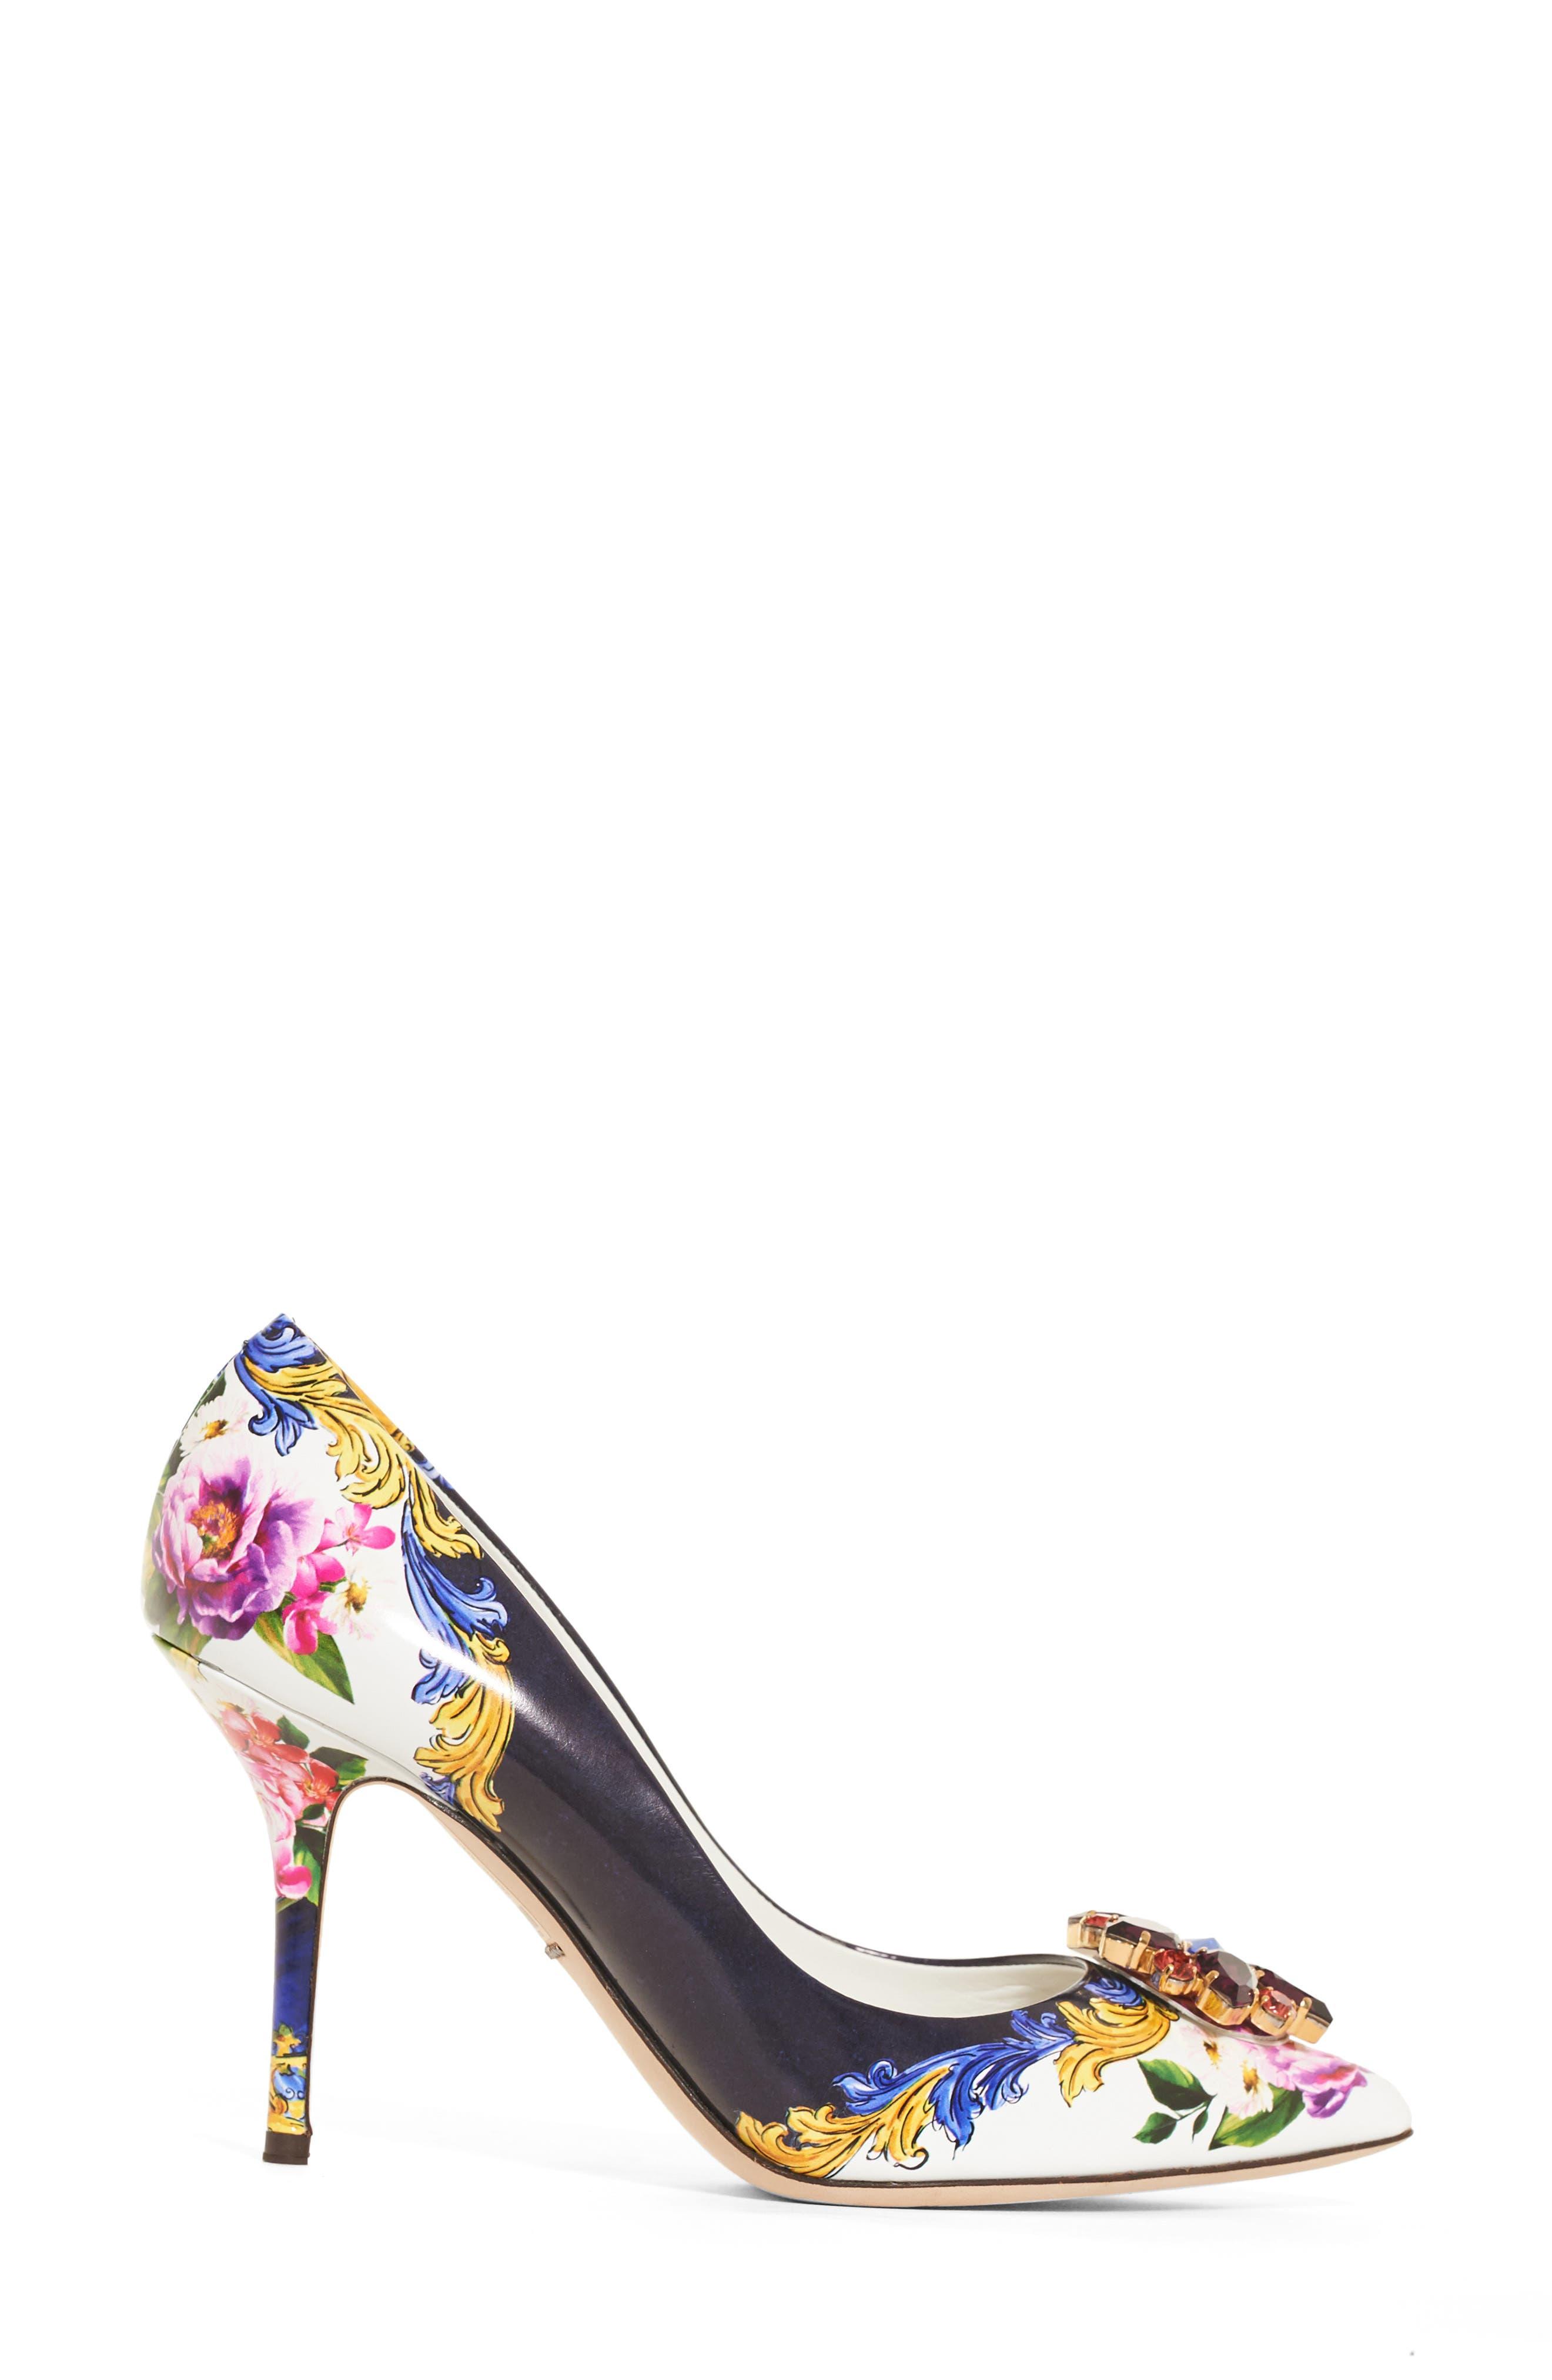 Dolce & Gabbana Print Pump,                             Alternate thumbnail 3, color,                             410